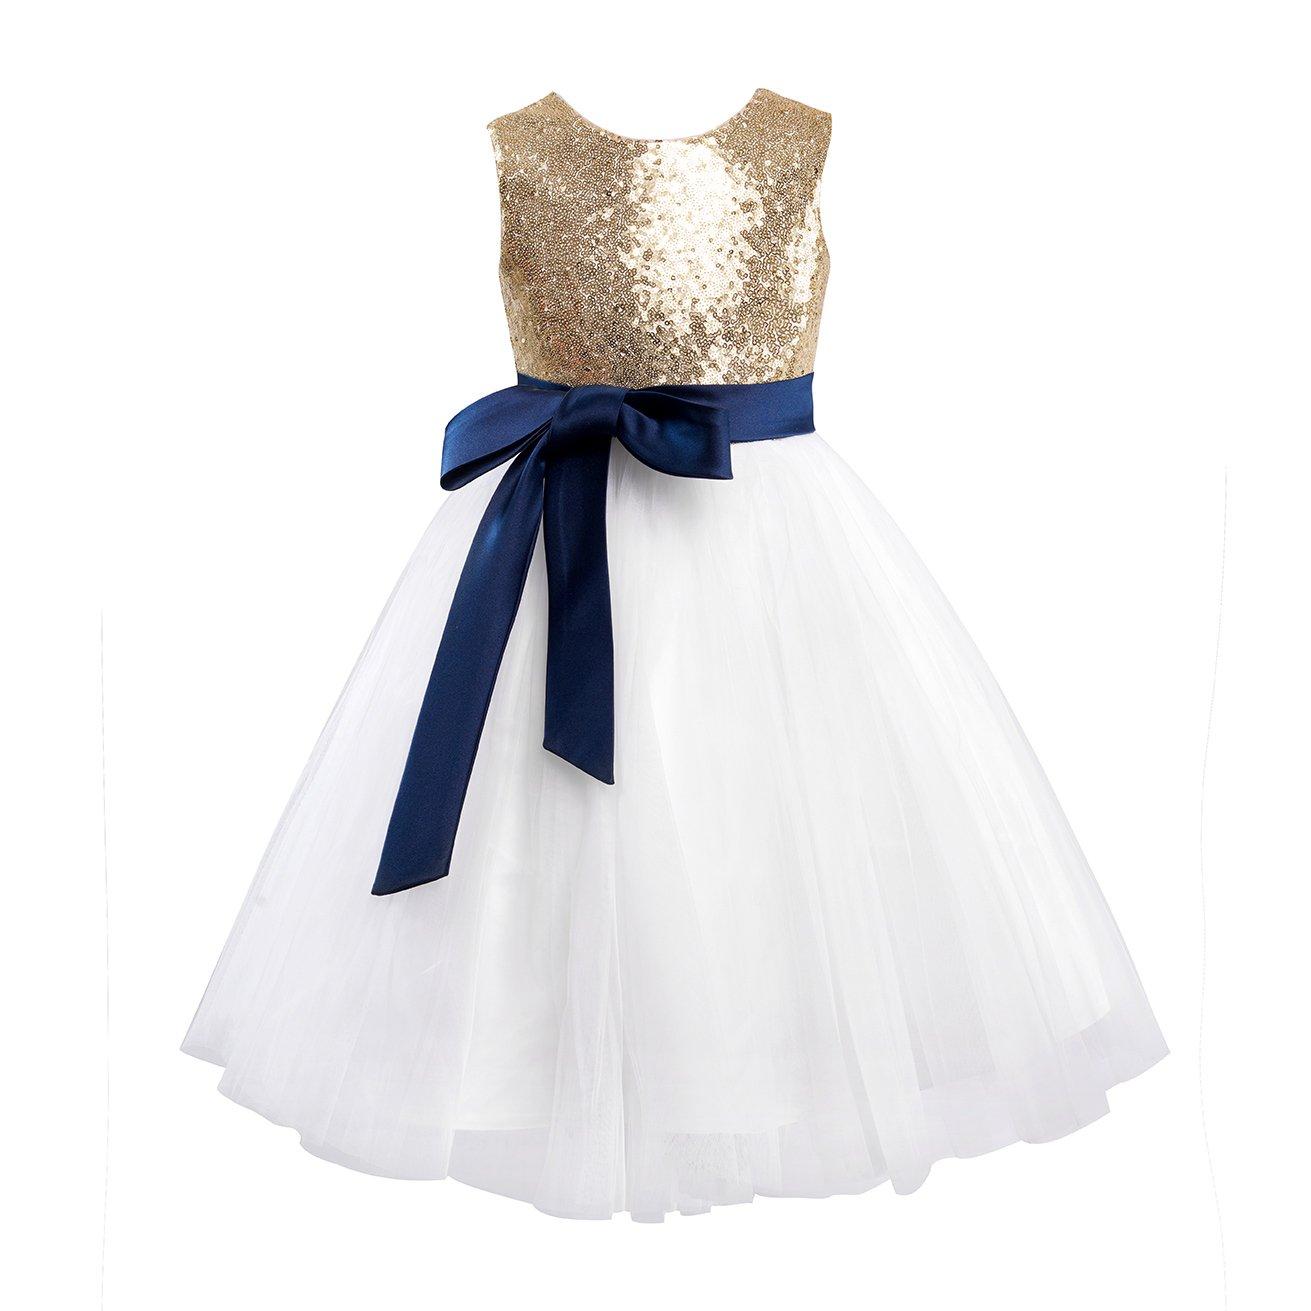 Miama Gold Sequin Ivory Tulle Wedding Flower Girl Dress Junior Bridesmaid Dress